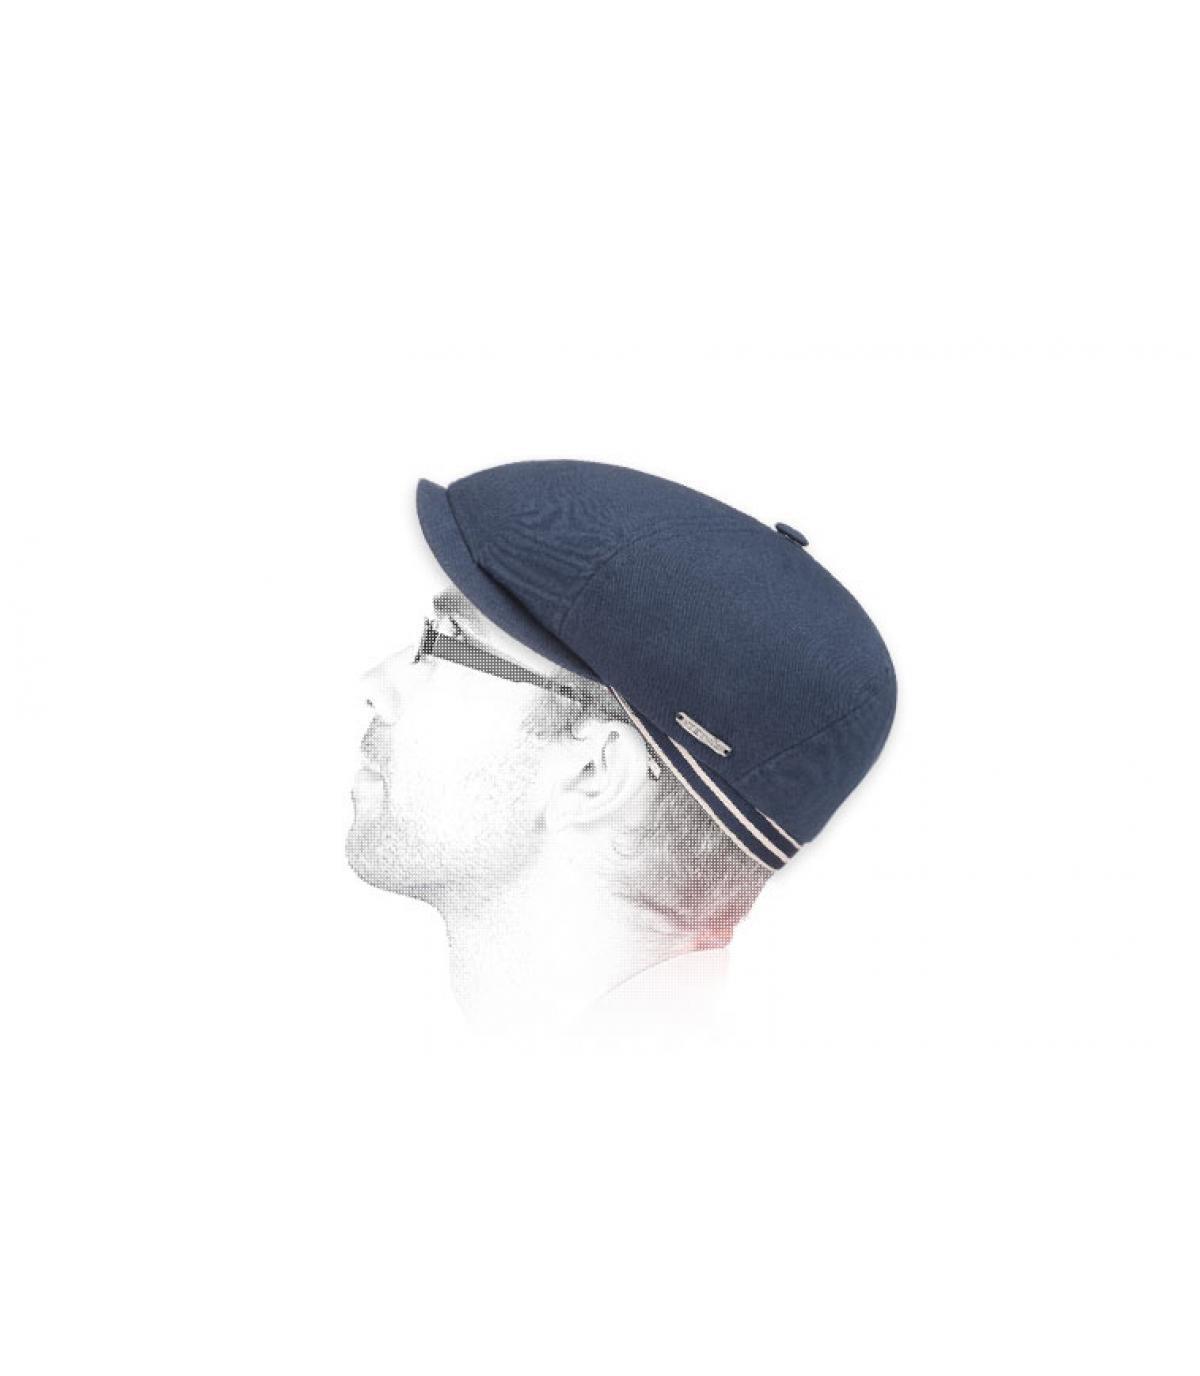 marino Stetson visera del vendedor de periódicos